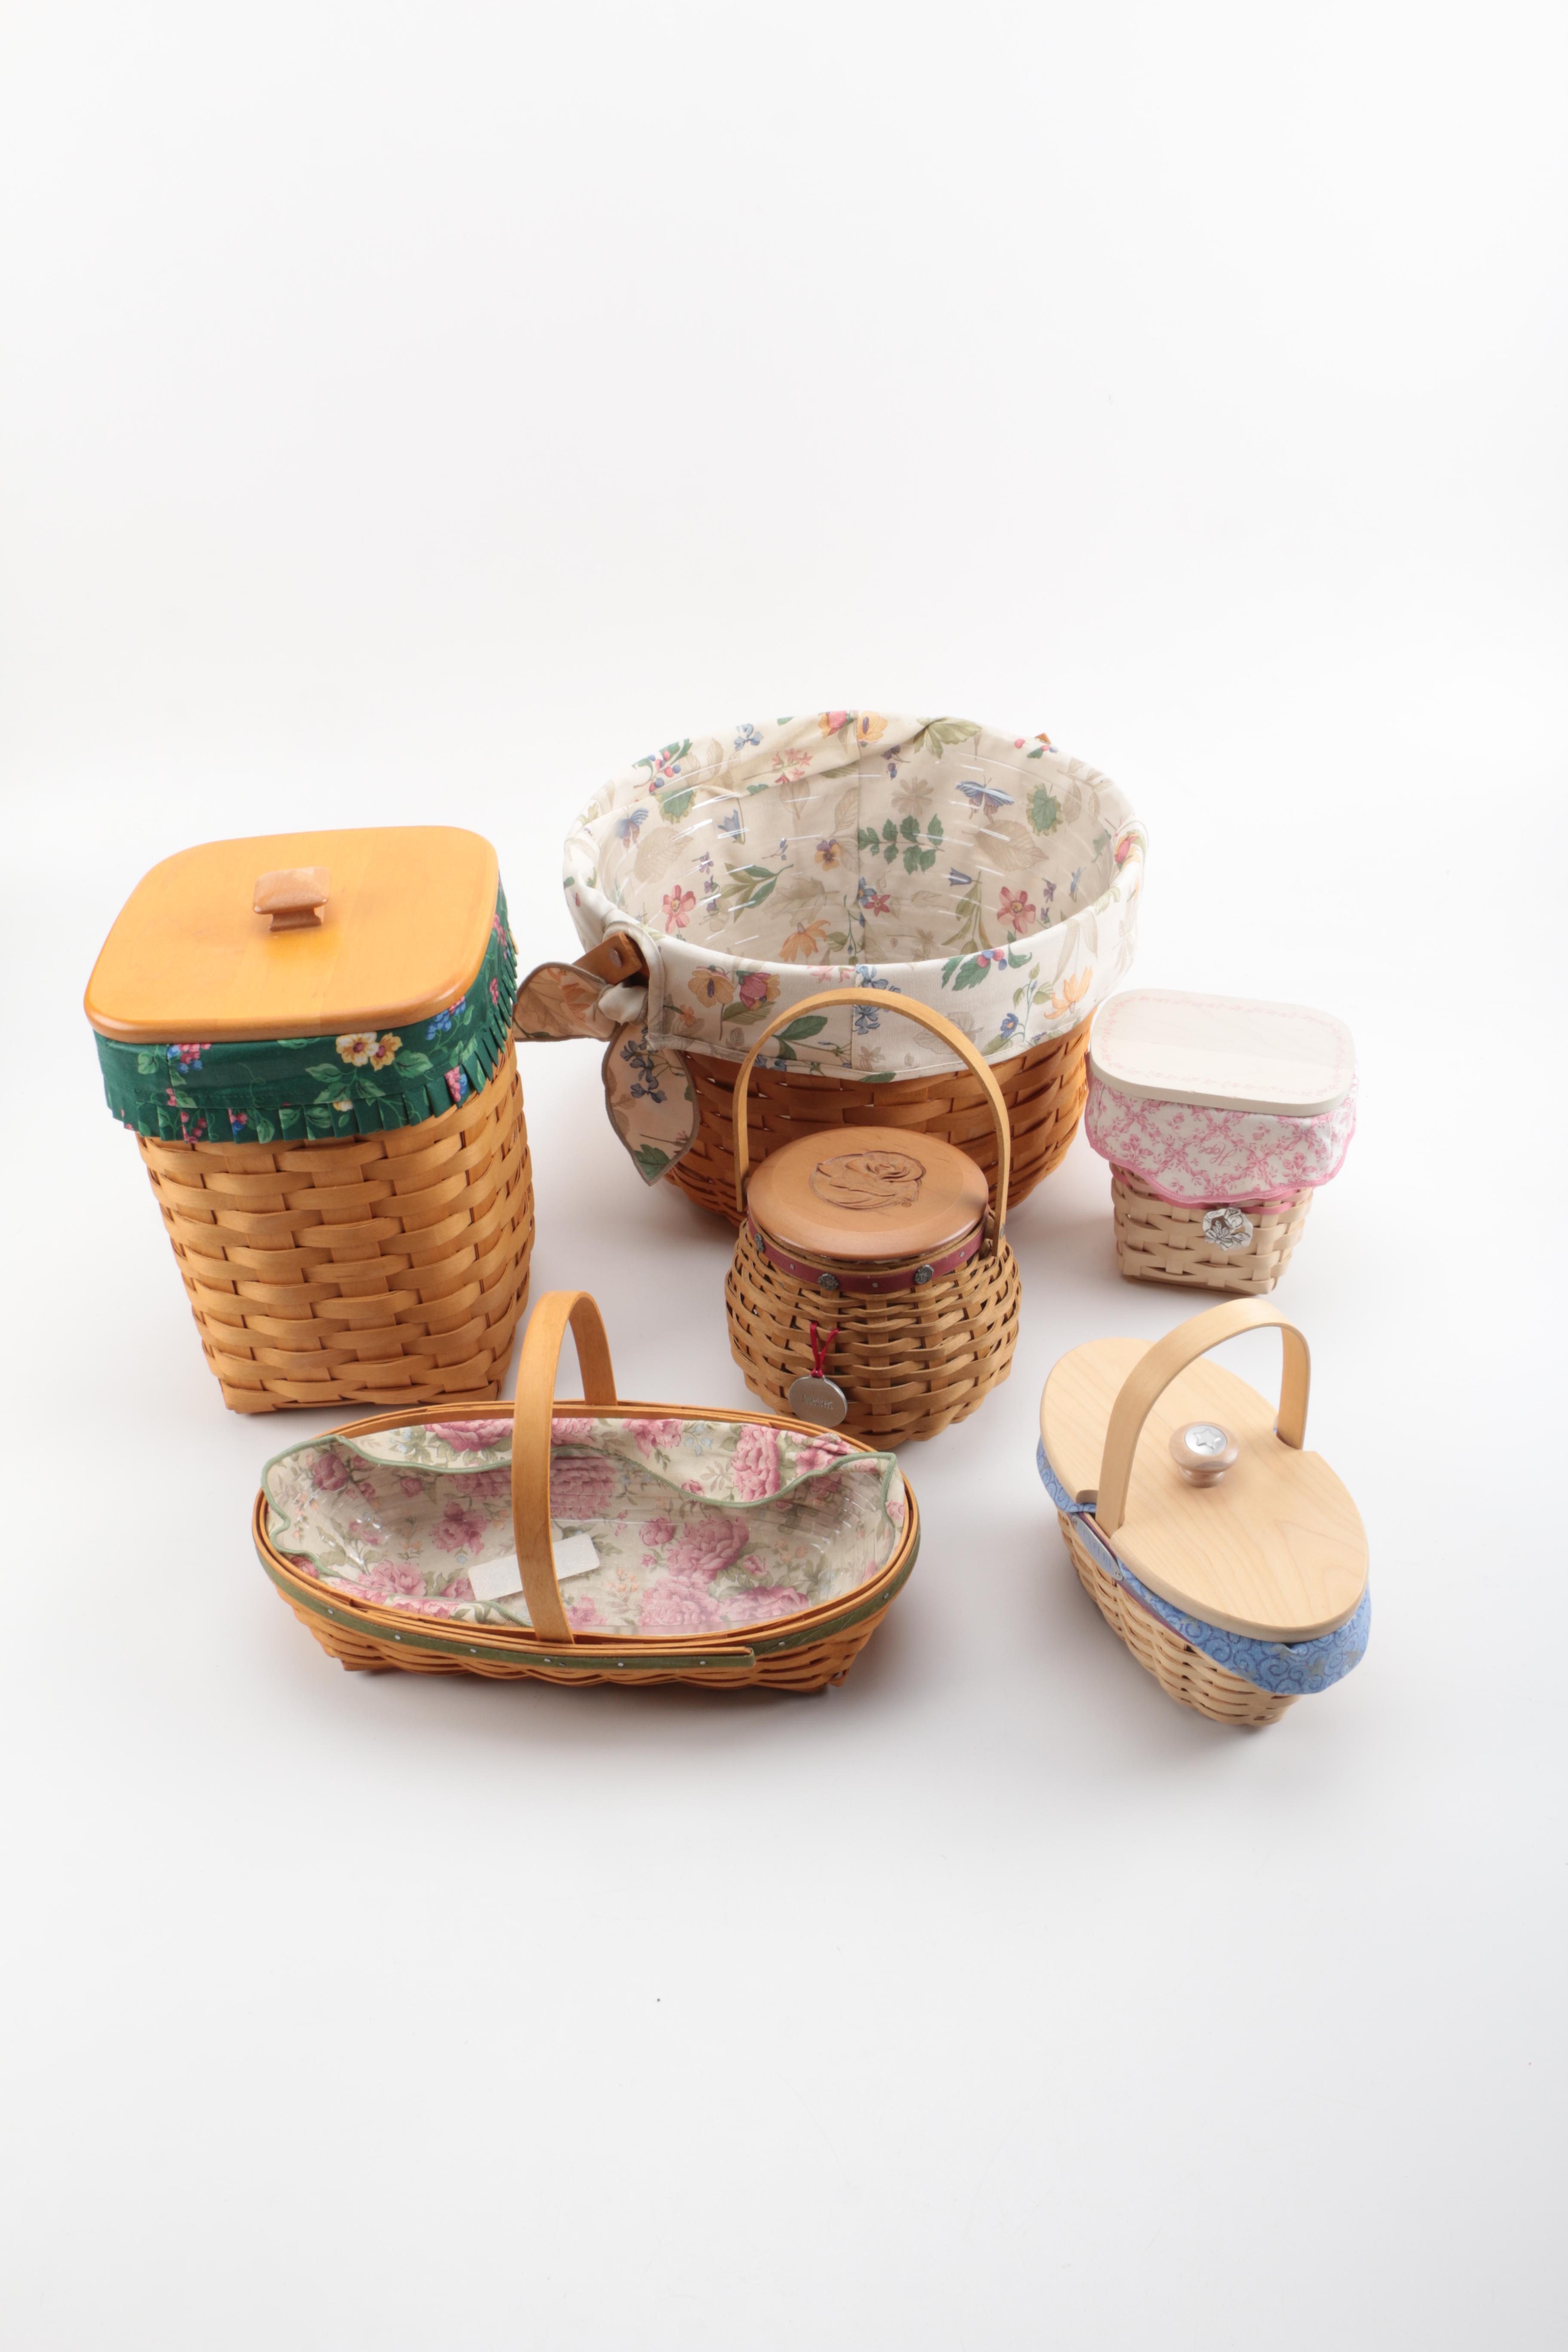 Assortment of Longaberger Baskets